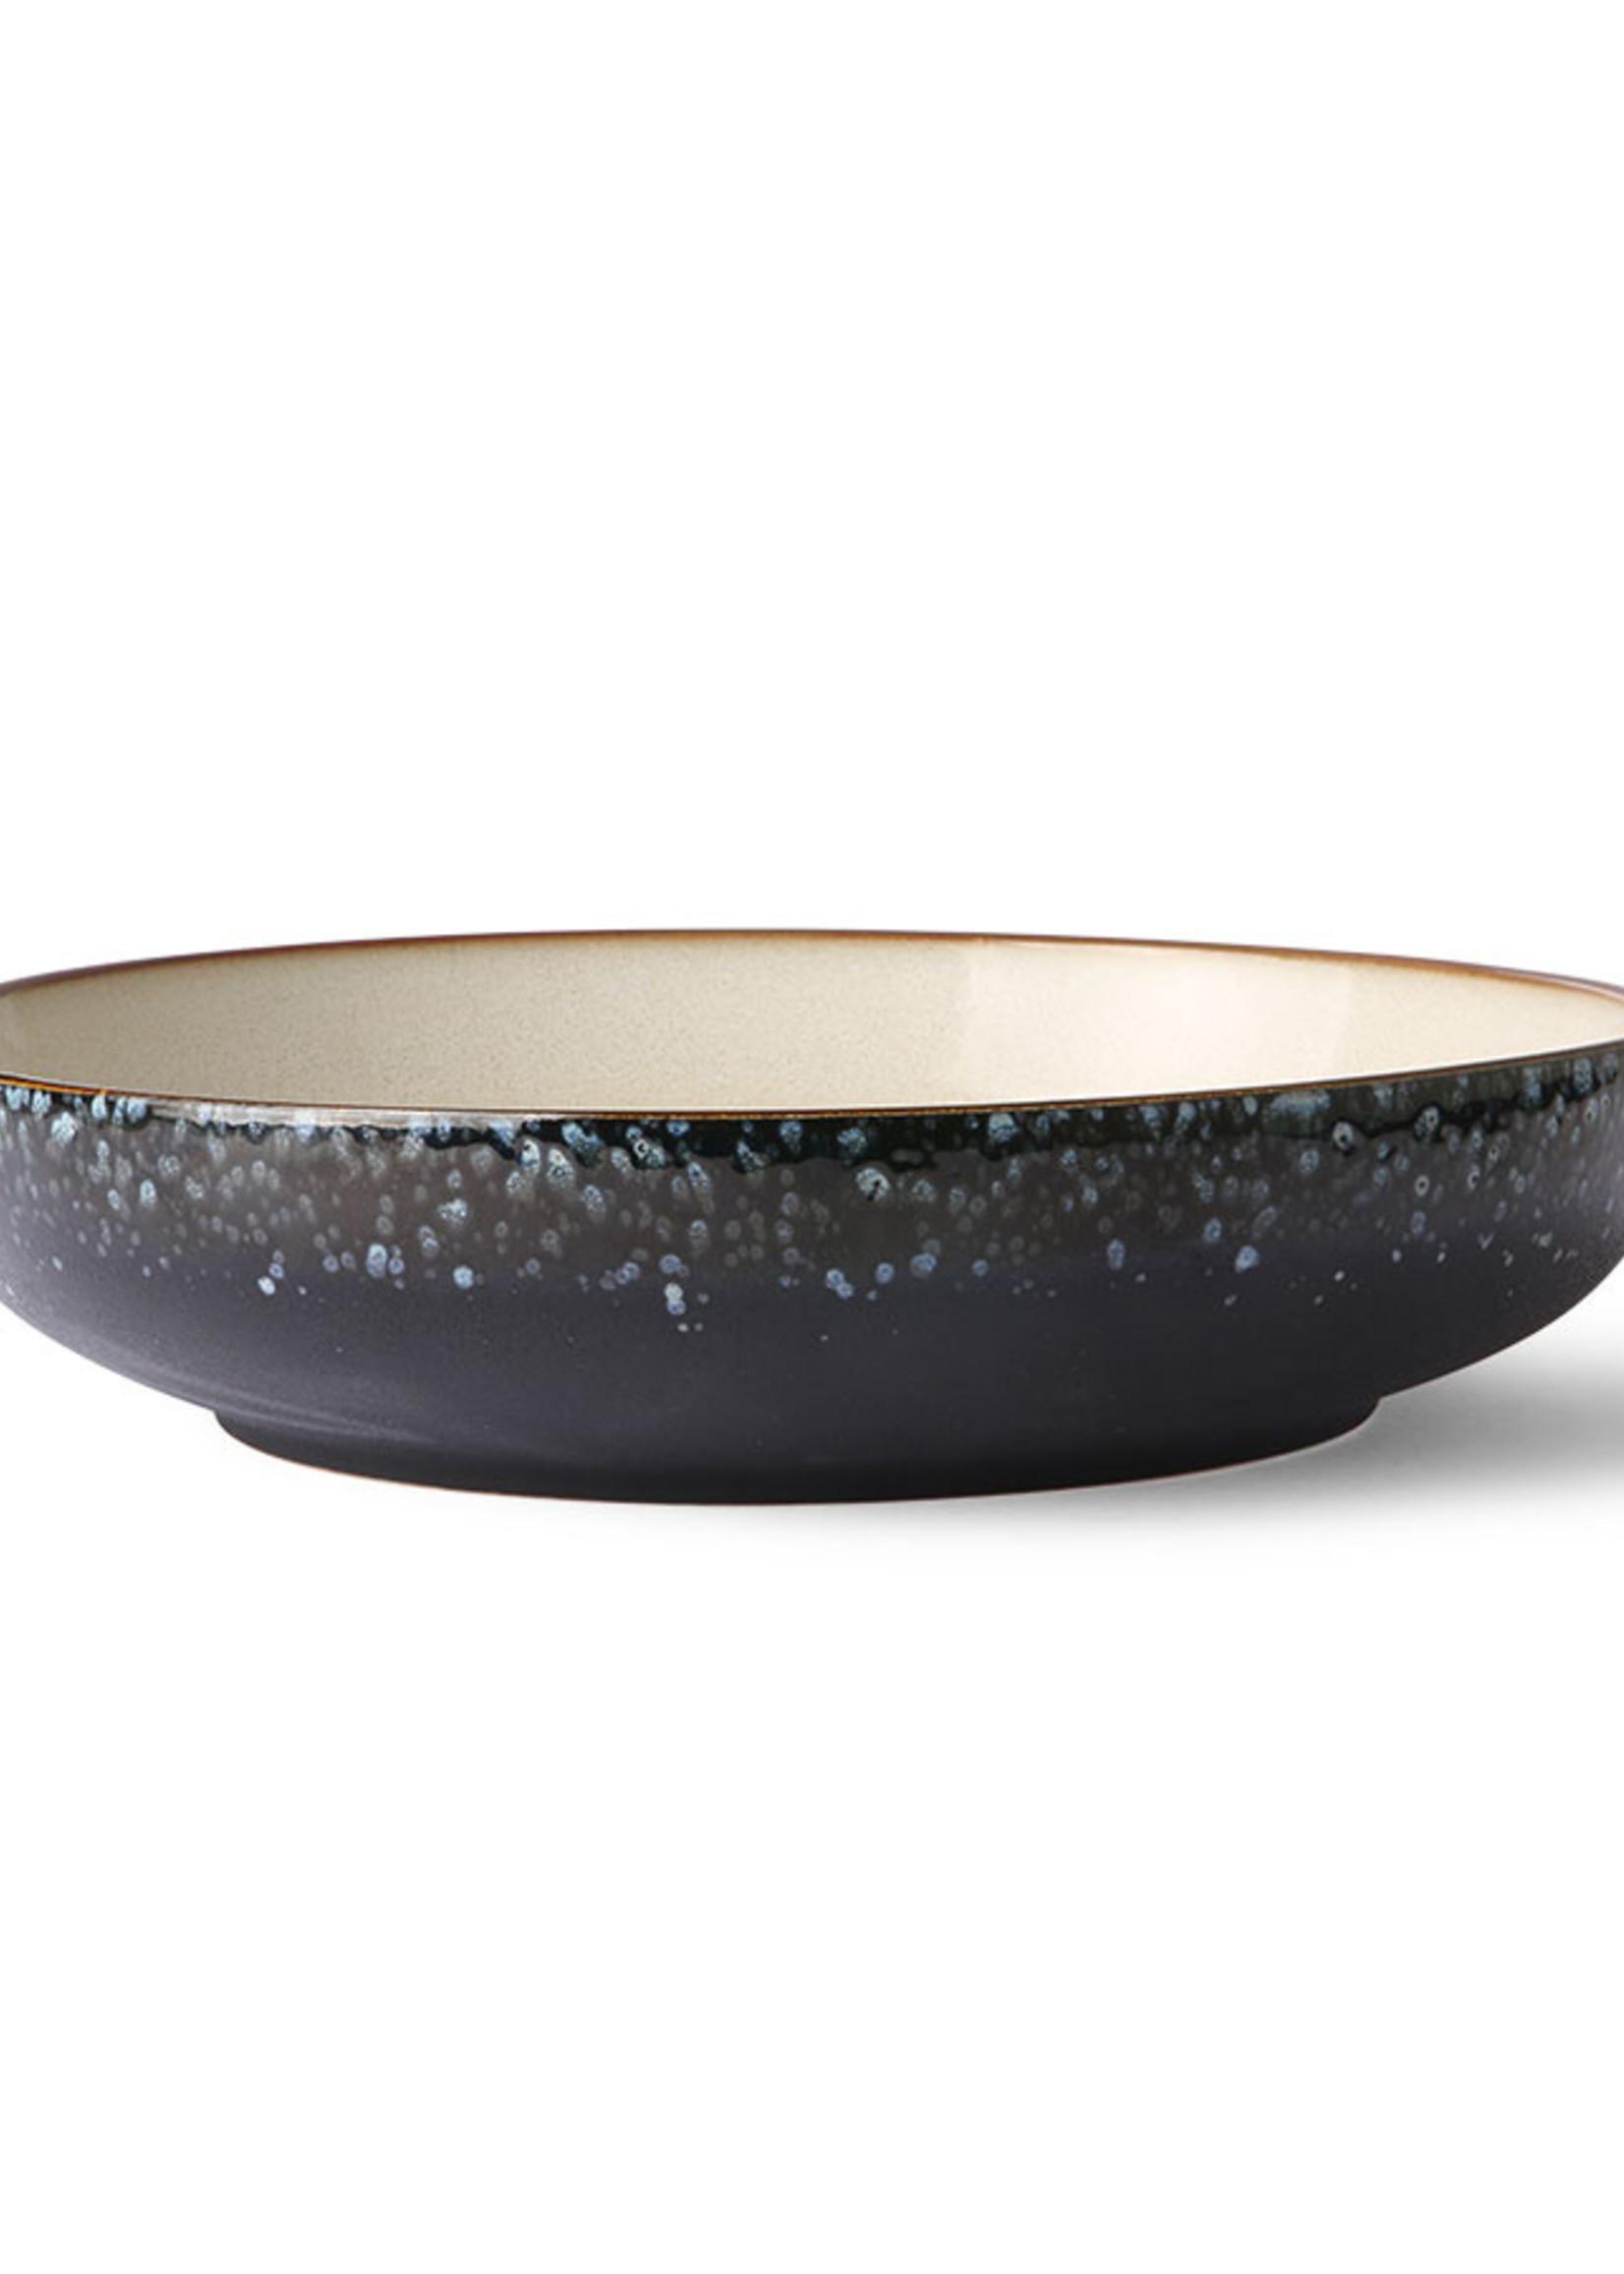 HK living Ceramic 70's salad bowl: galaxy